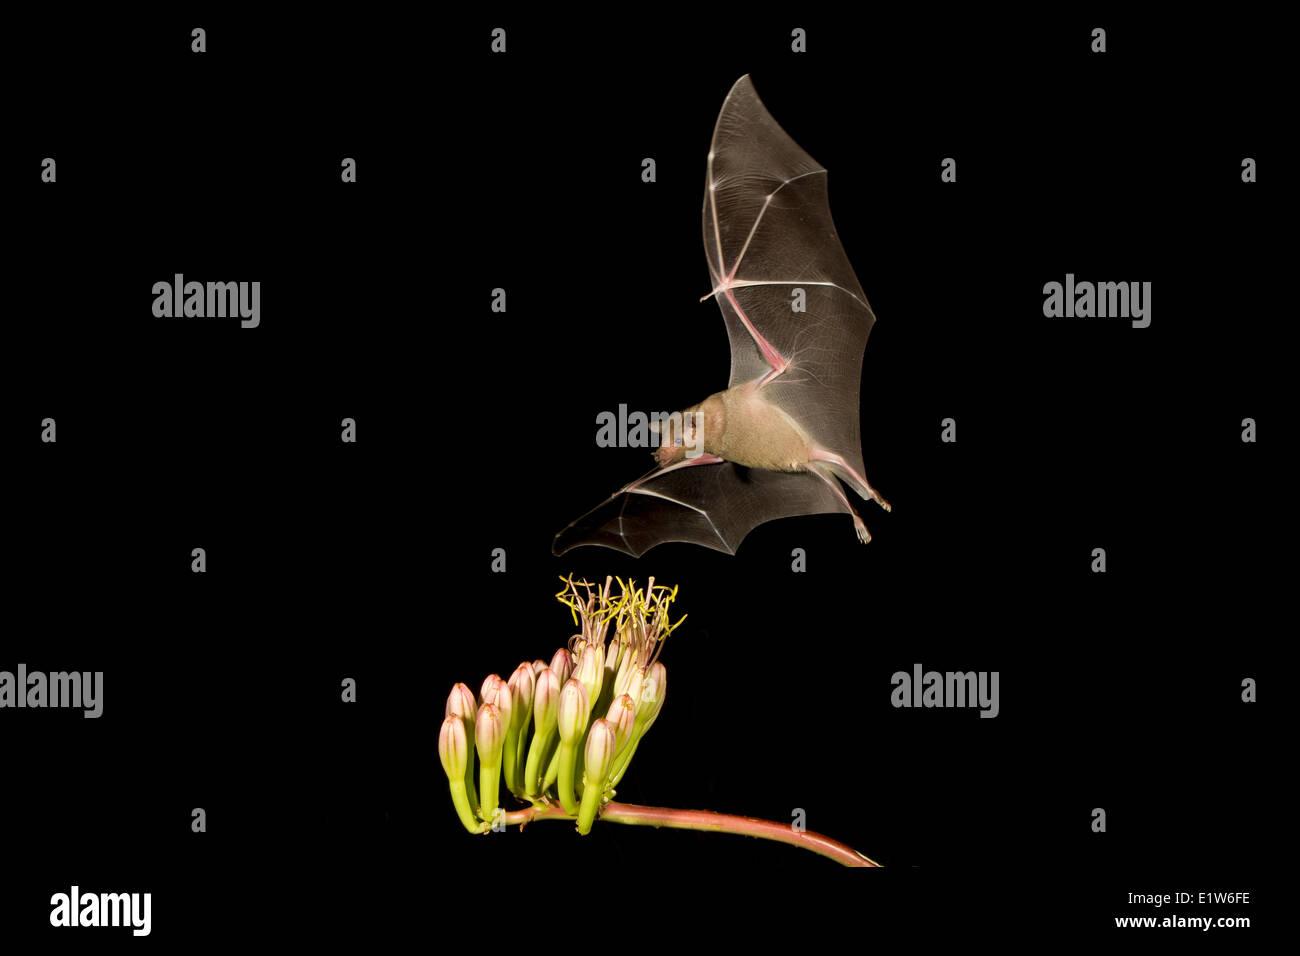 Menor de larga nariz (murciélago Leptonycteris yerbabuenae), alimentándose de Agave flor, Amado, Arizona. Este murciélago está clasificada como vulnerable. Foto de stock